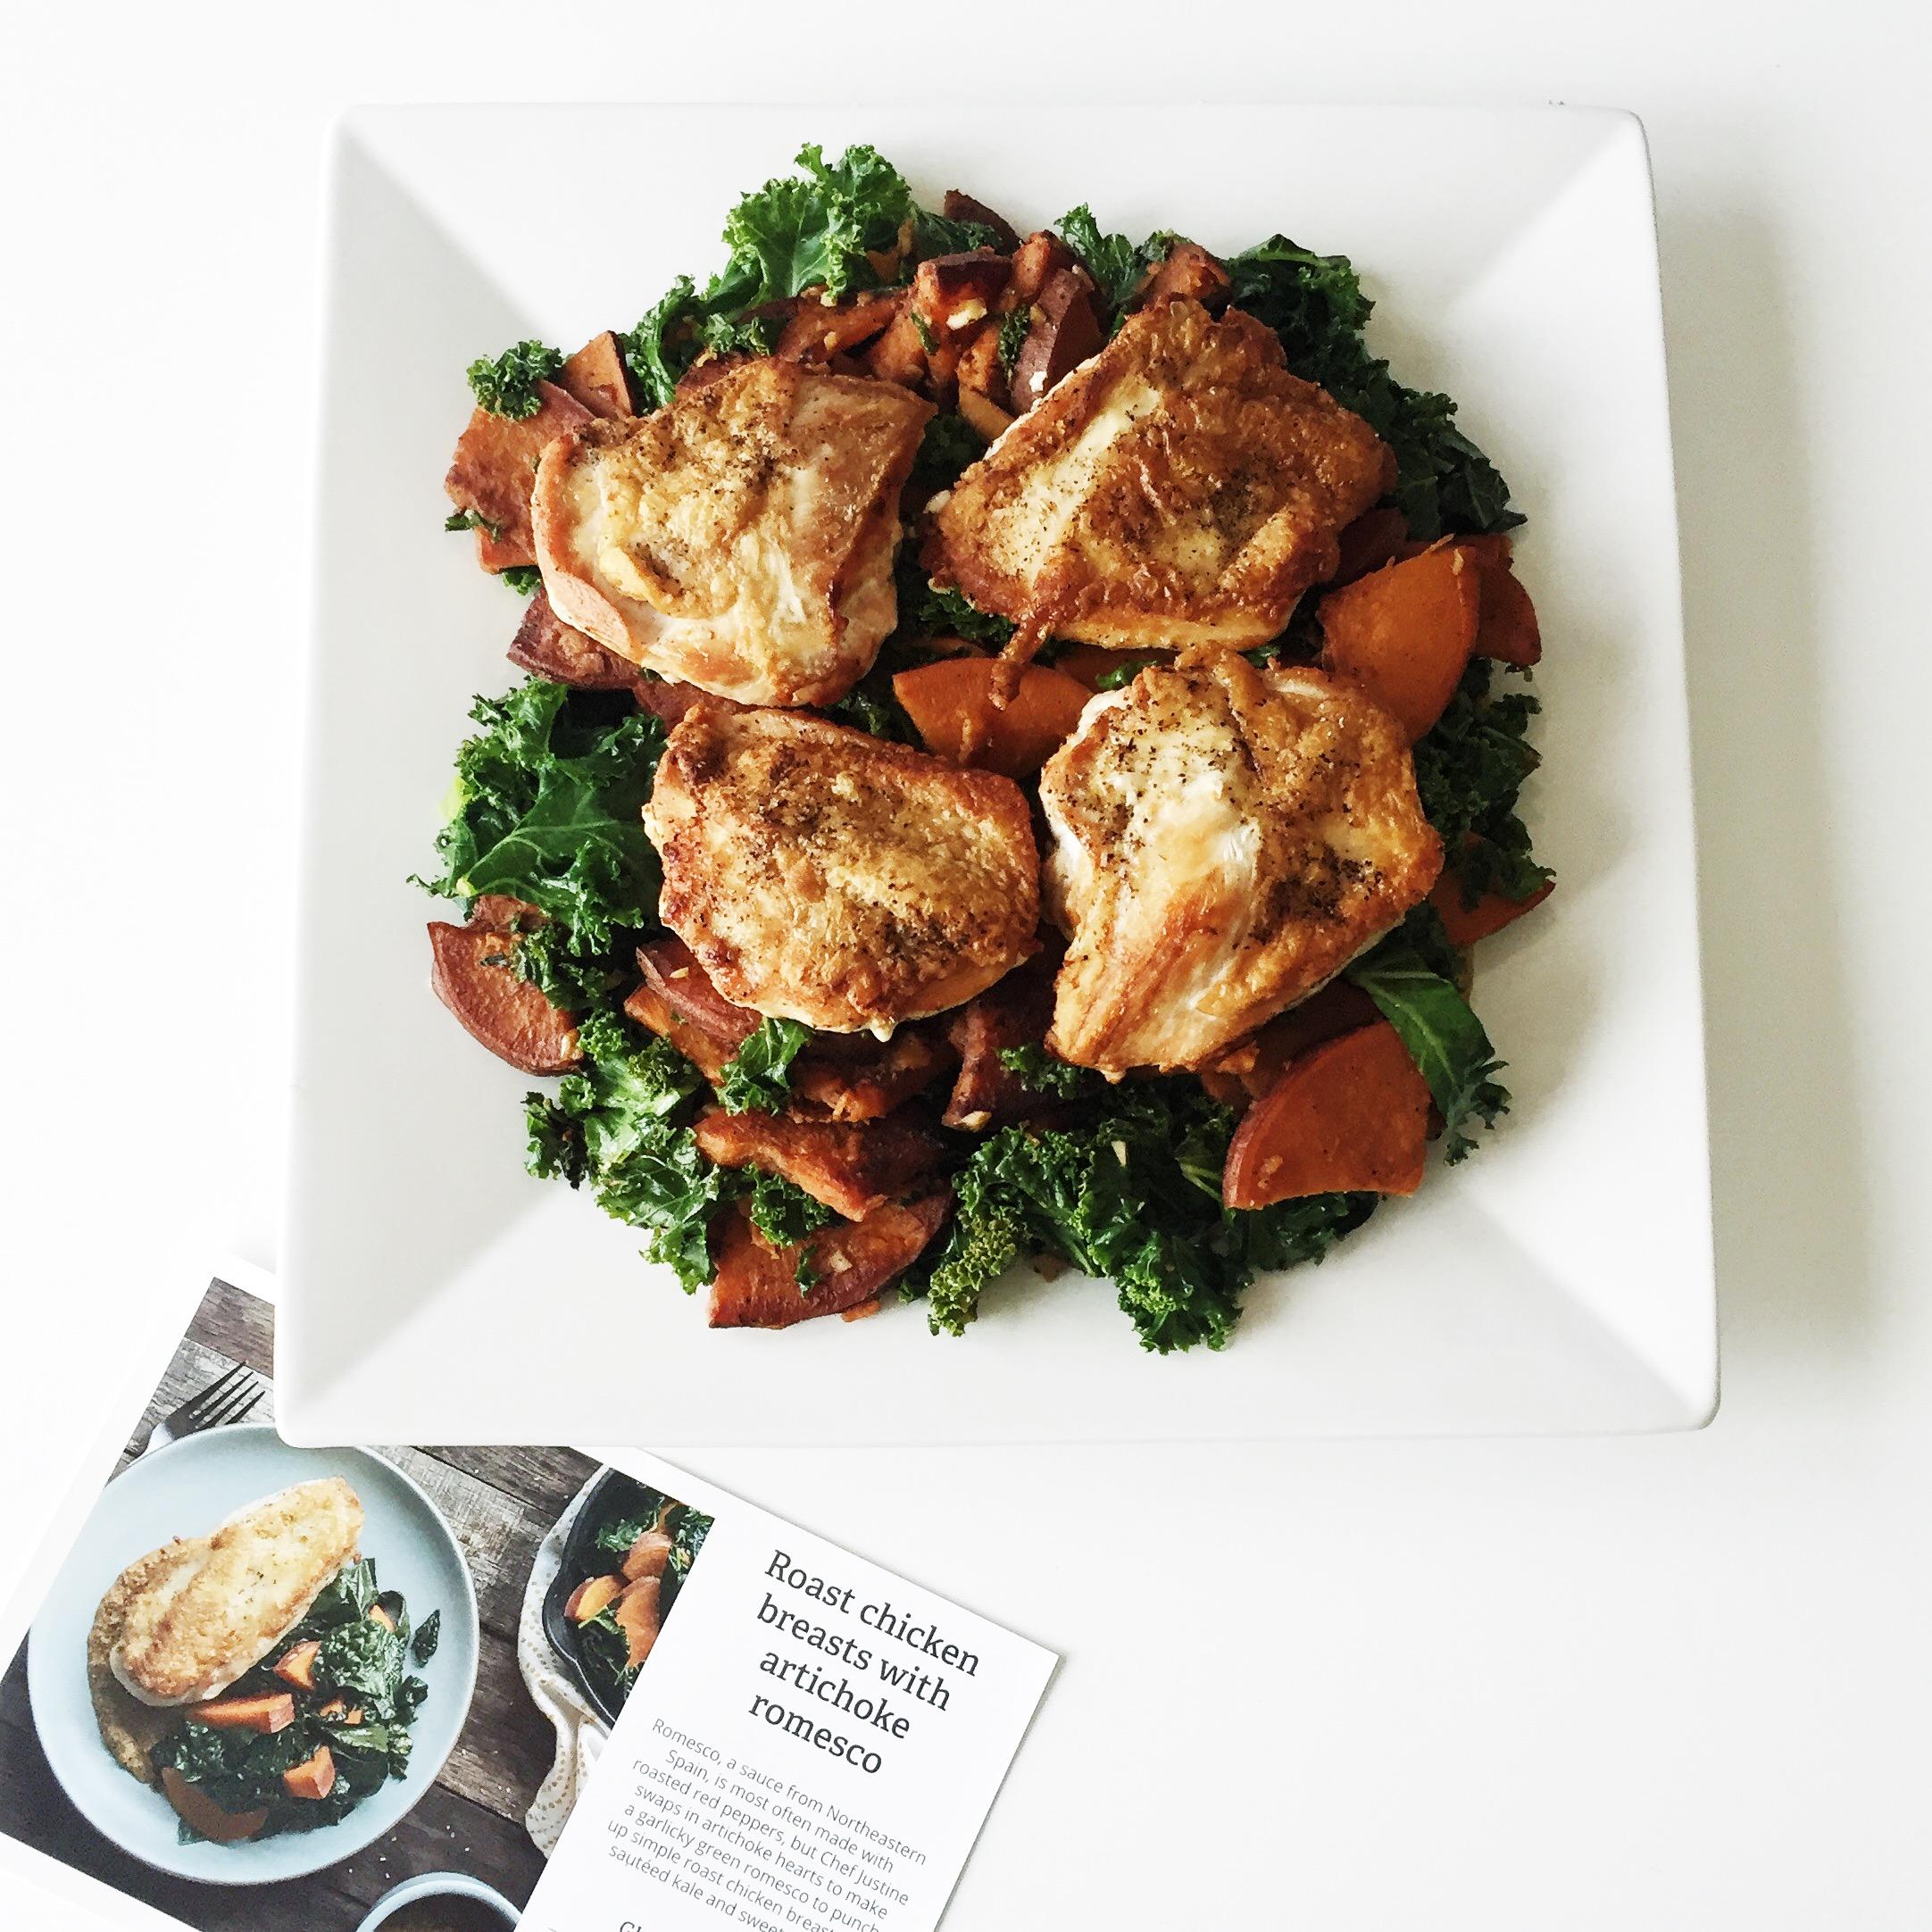 Roast chicken breast with artichoke romesco.